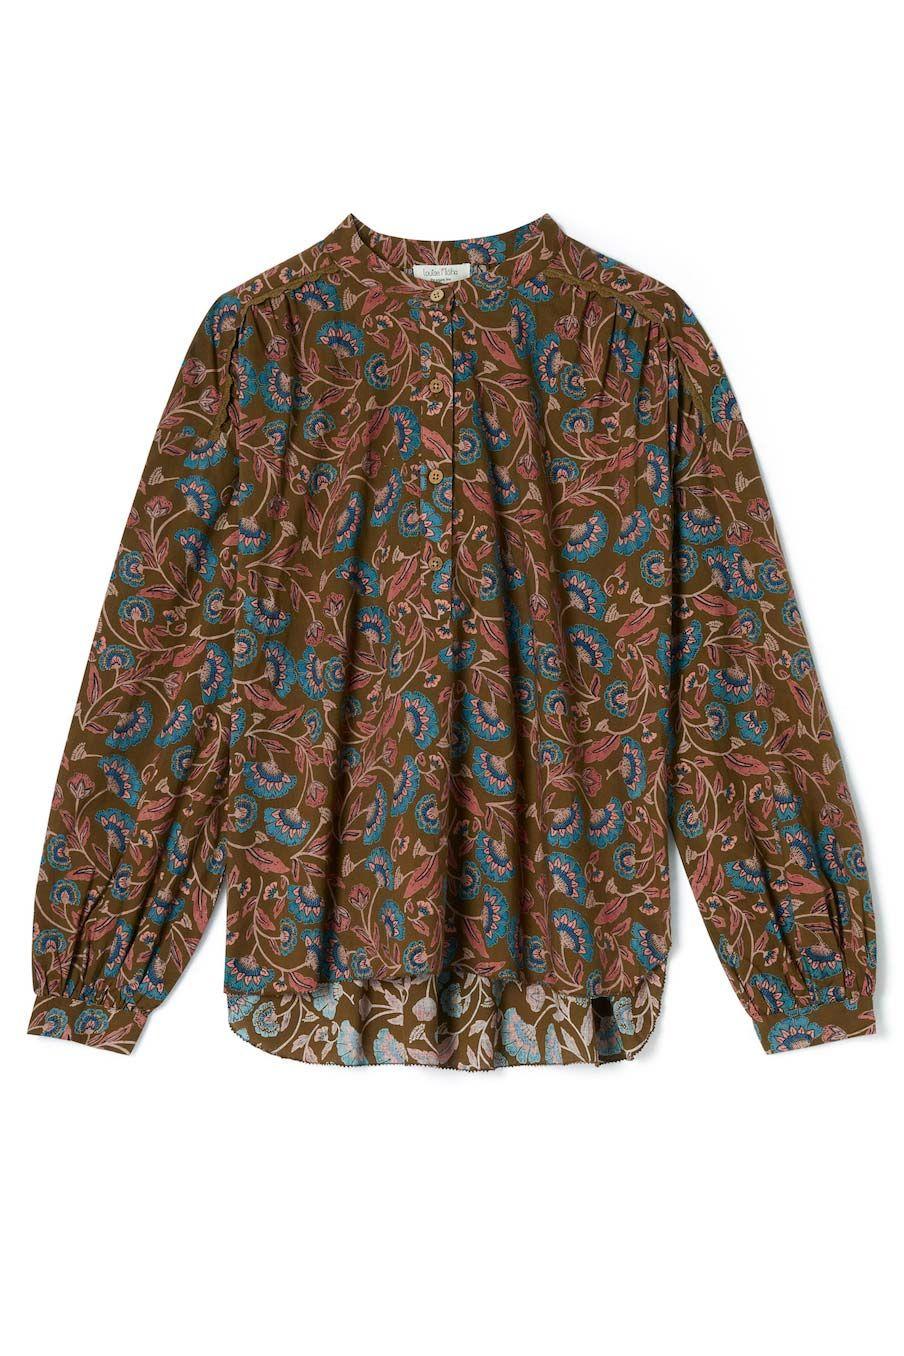 boheme chic vintage blouse femme ajay bronze folk flowers